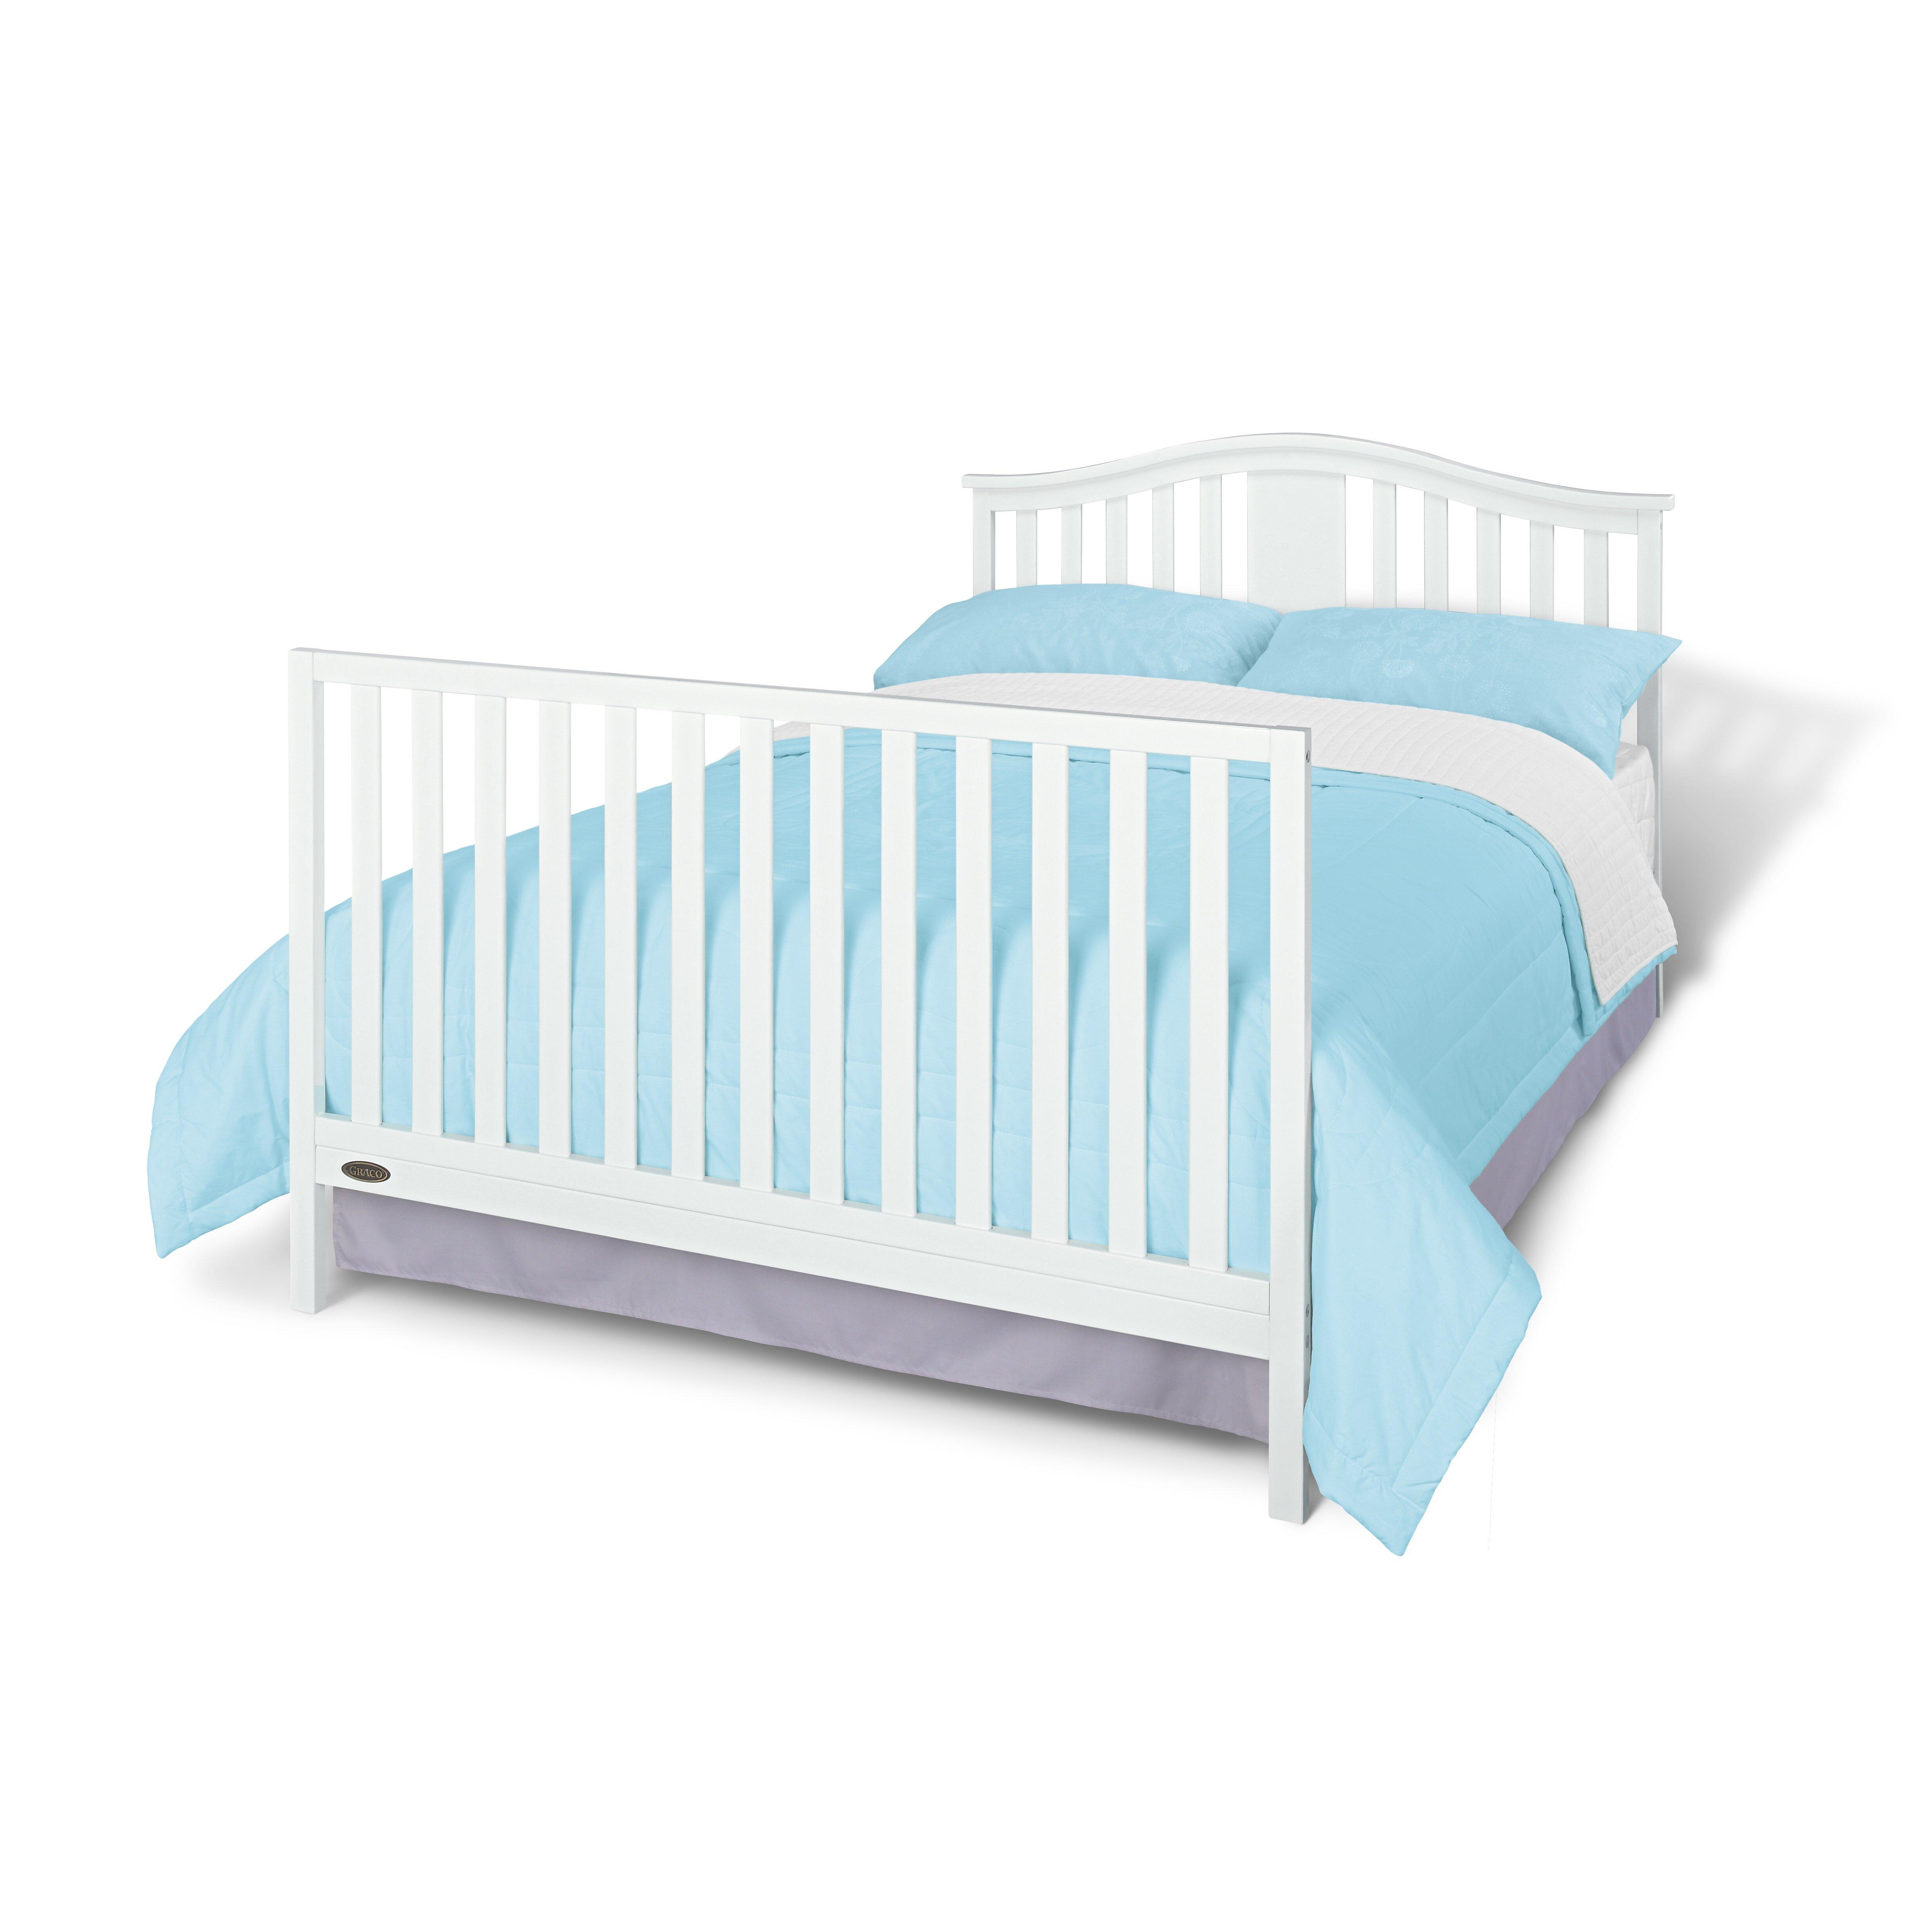 Graco Convertible Cribs Graco Maple Ridge 4in1